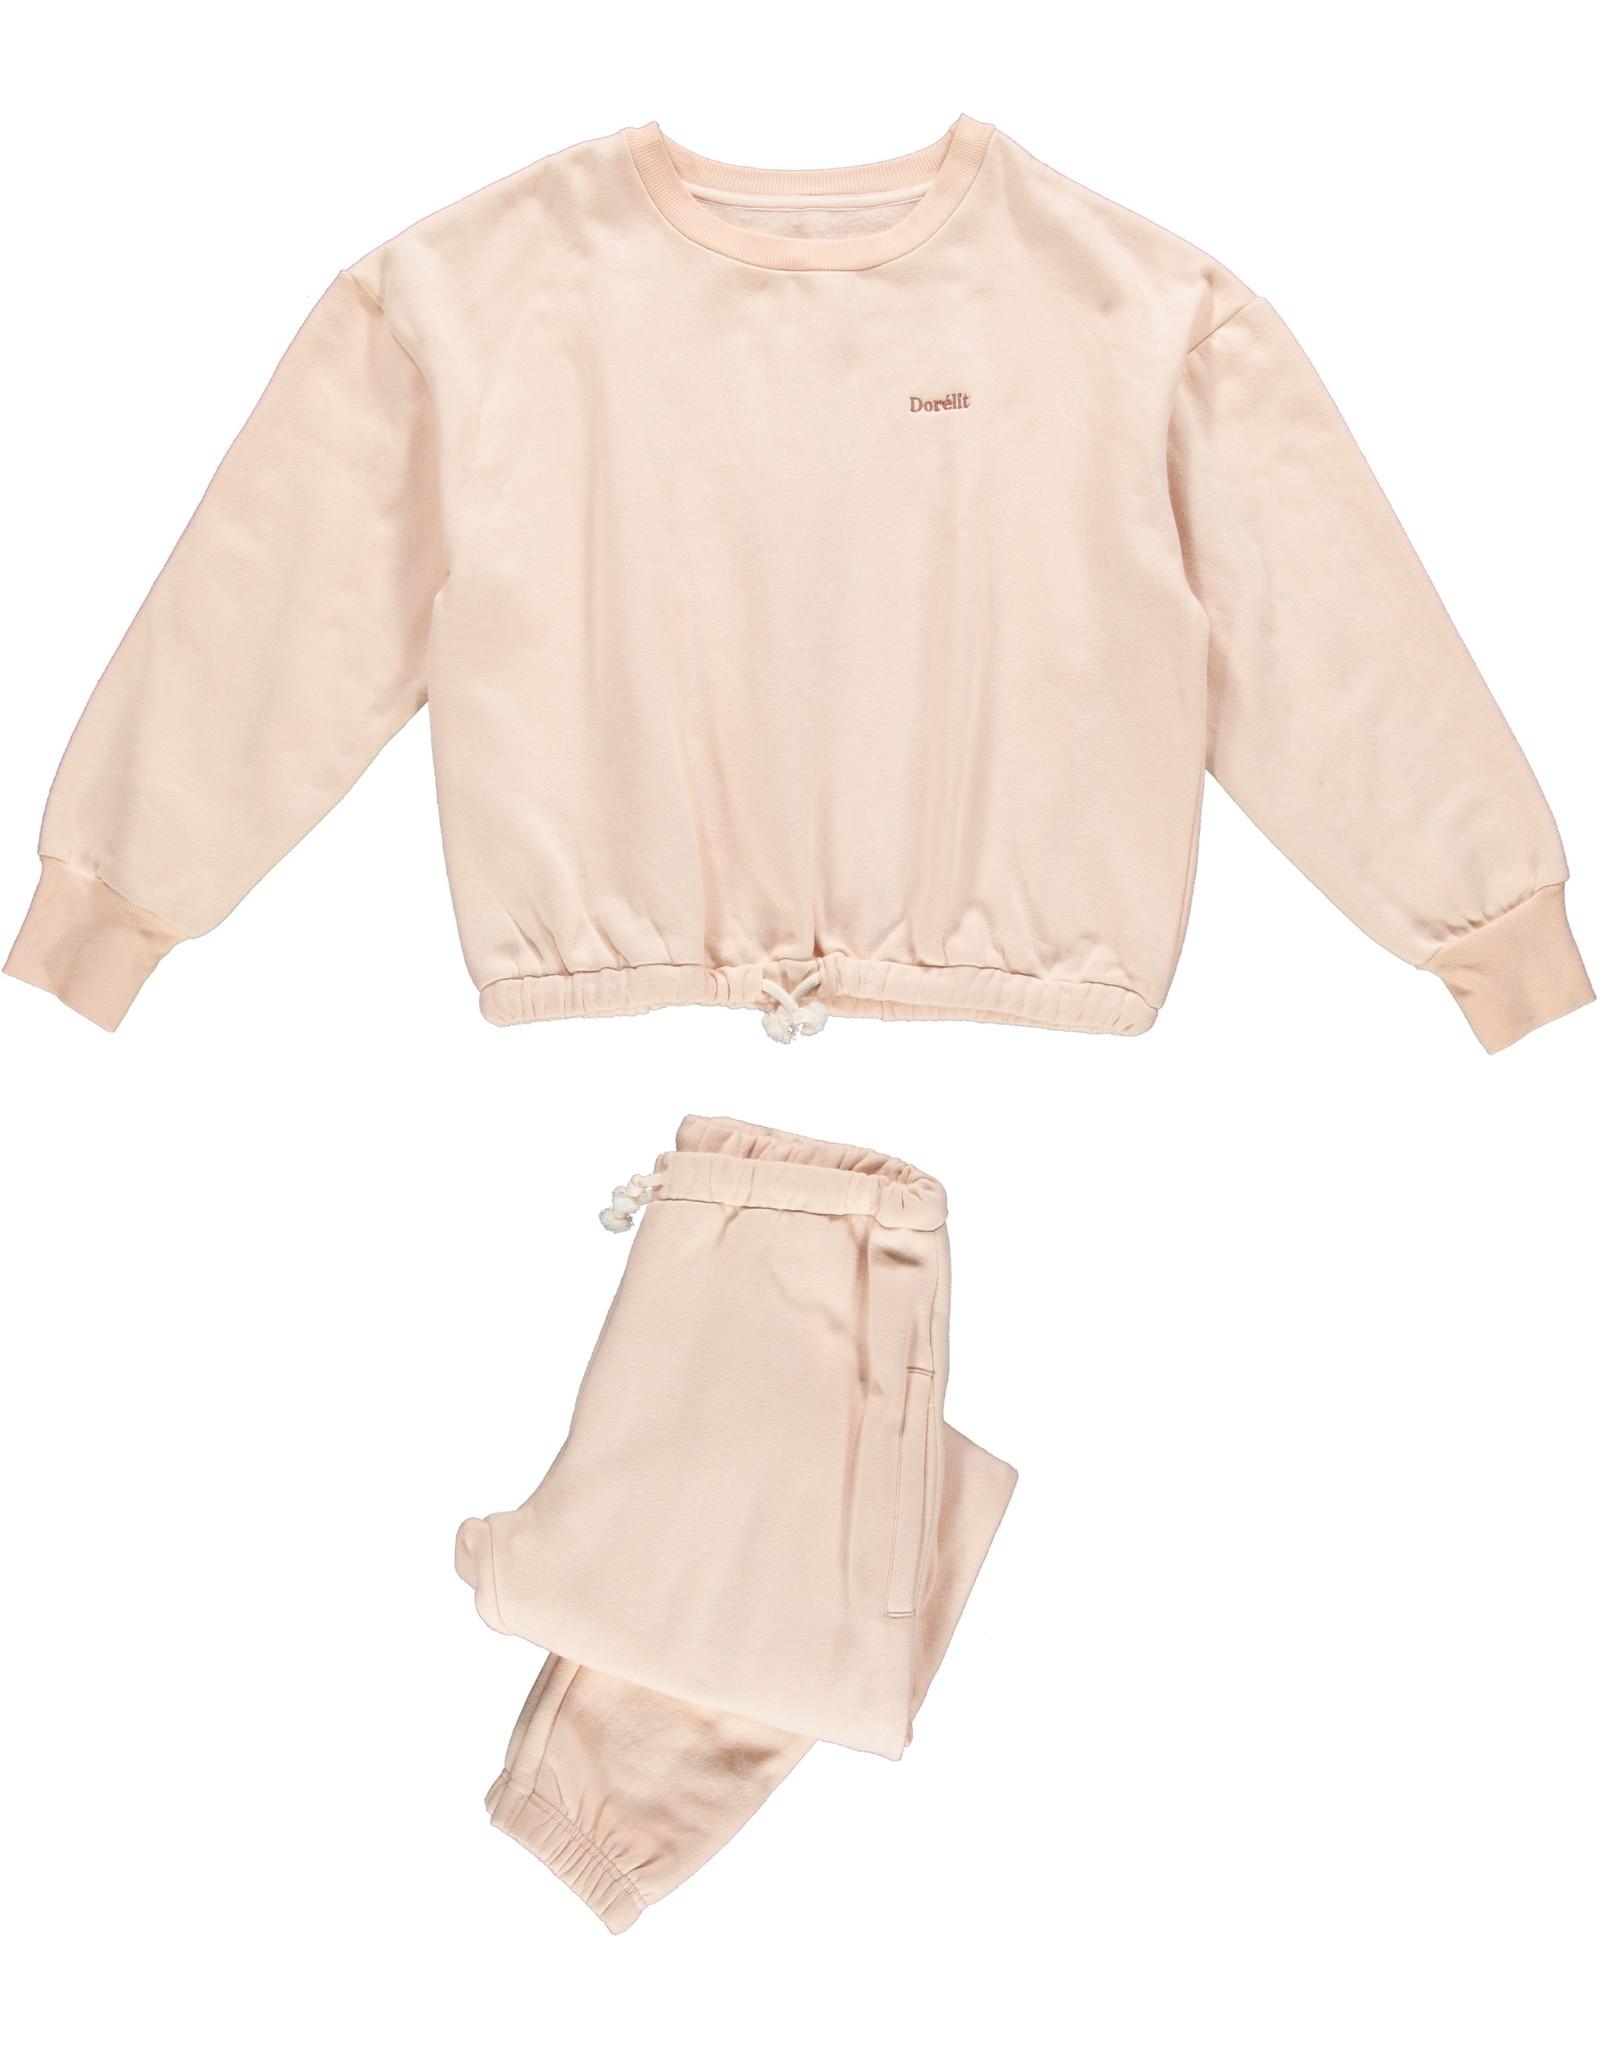 Dorélit Freya + Felix | Pajama Set Fleece | Rose